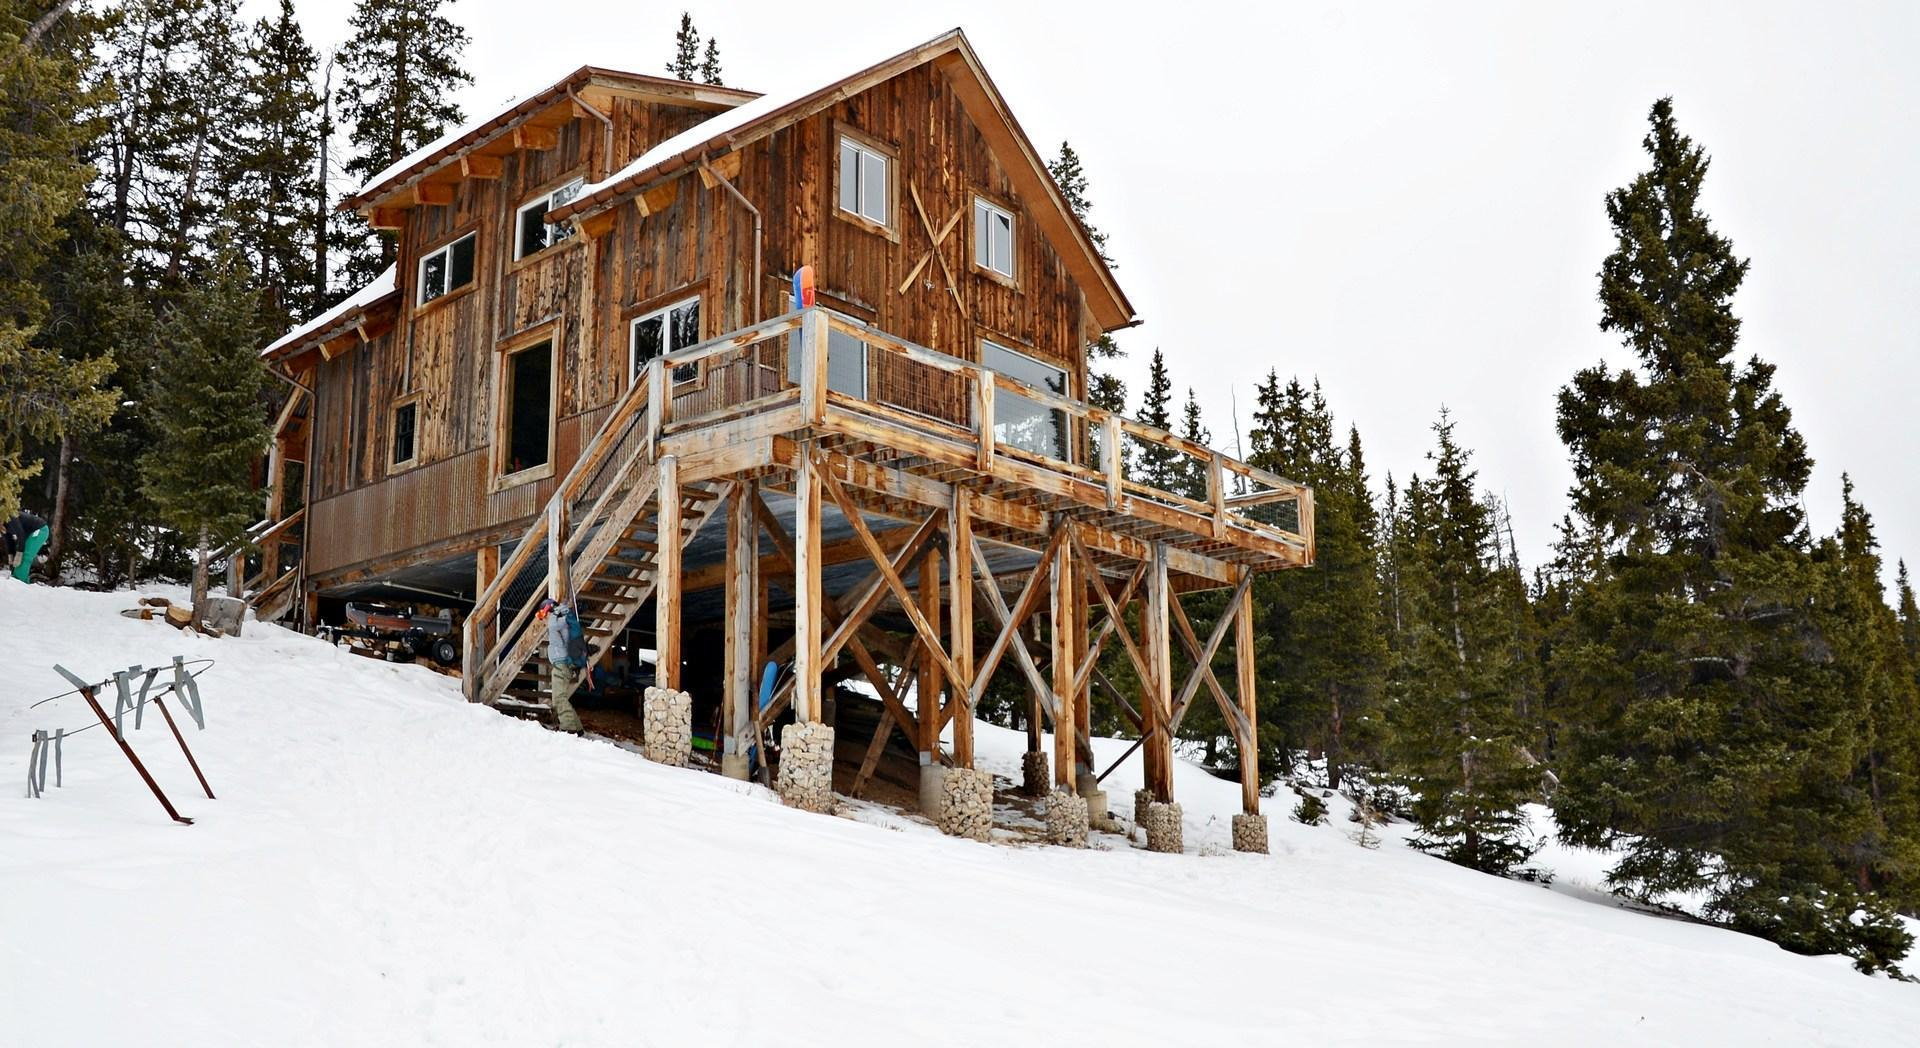 Backcountry Huts - Anna's Cabin